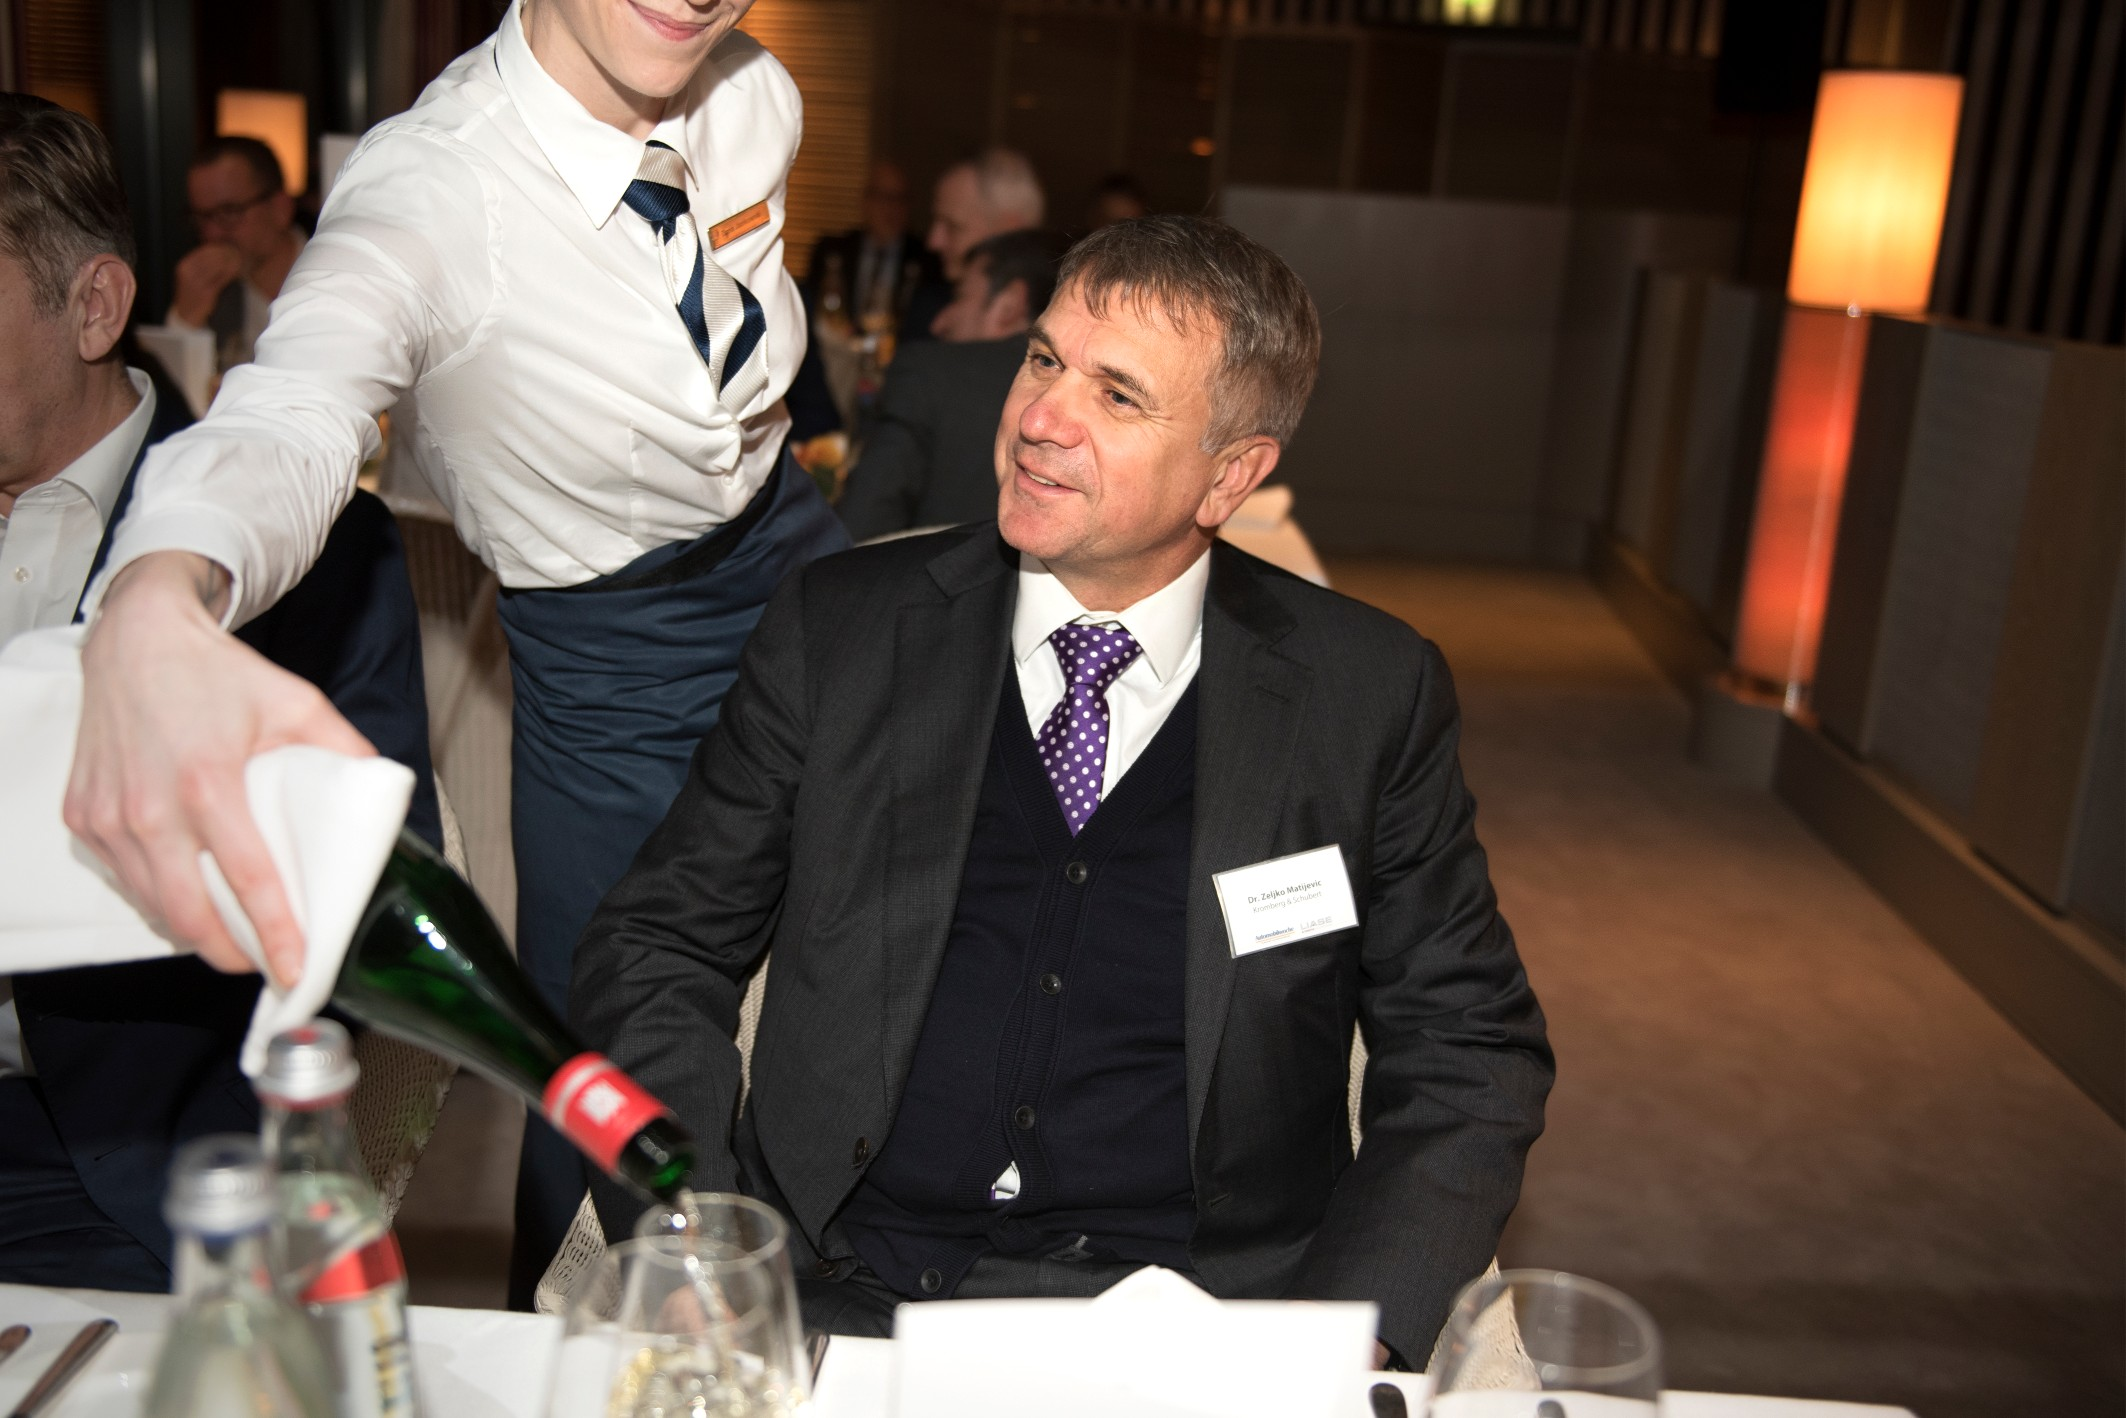 Zeljko Matijevic, CEO of Kromberg & Schubert GmbH.